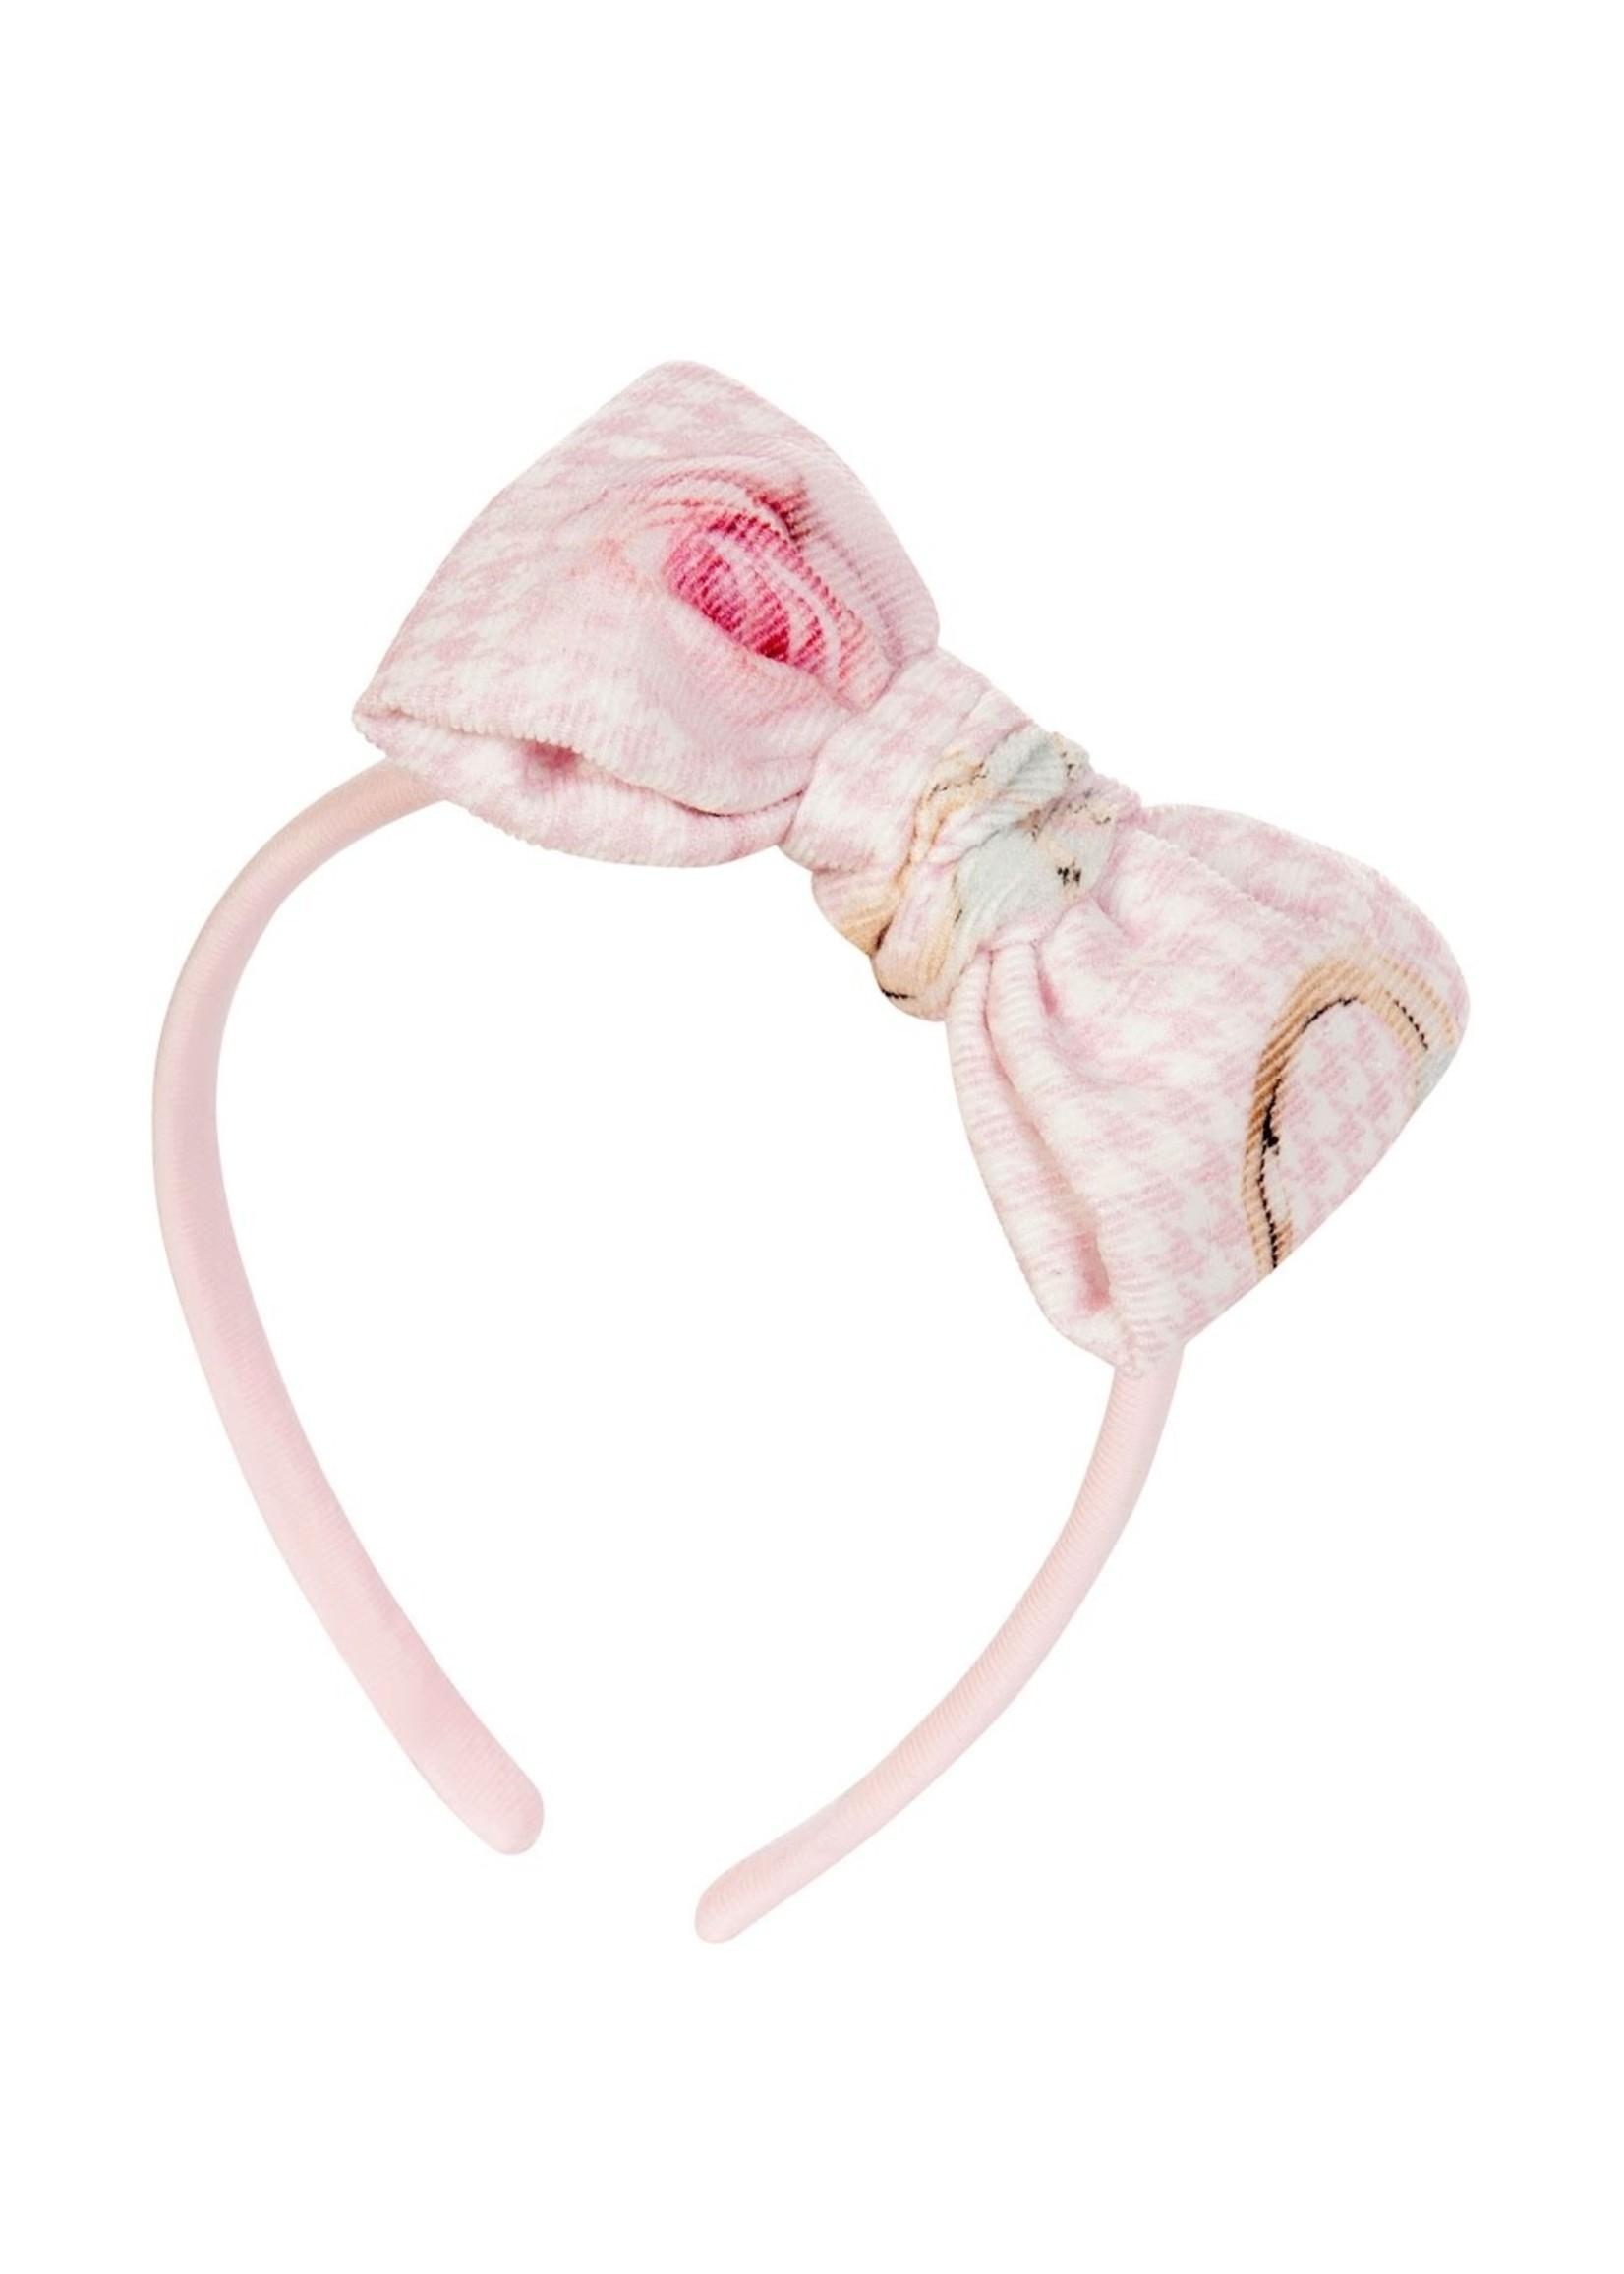 Balloon Chic Balloon Chic hairband pink